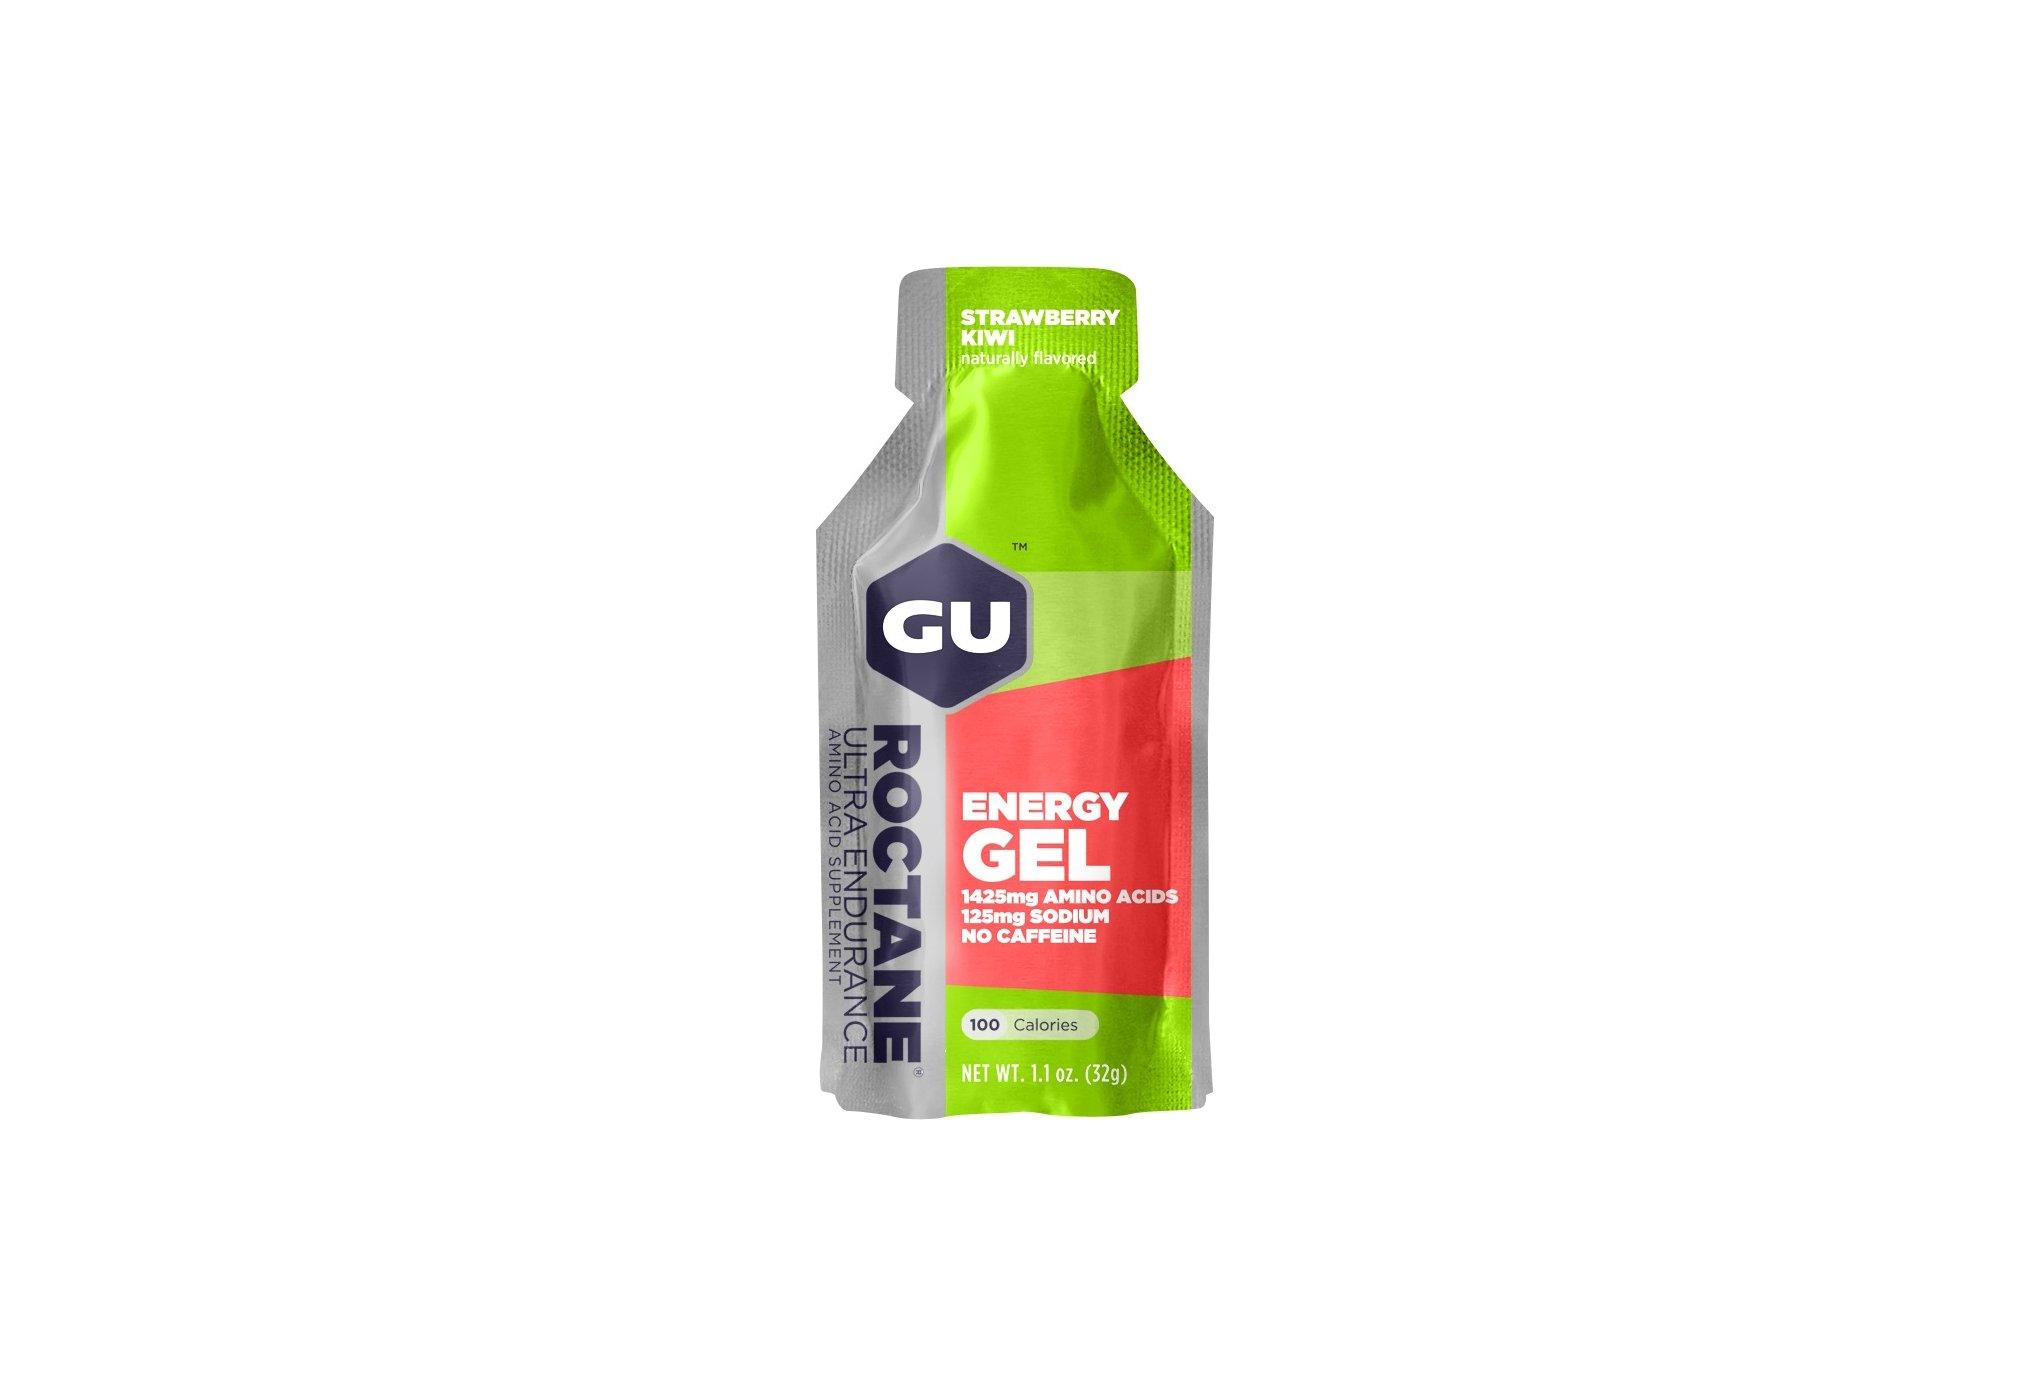 GU Gel Roctane Ultra Resistencia - Fresa/Kiwi Diététique Gels